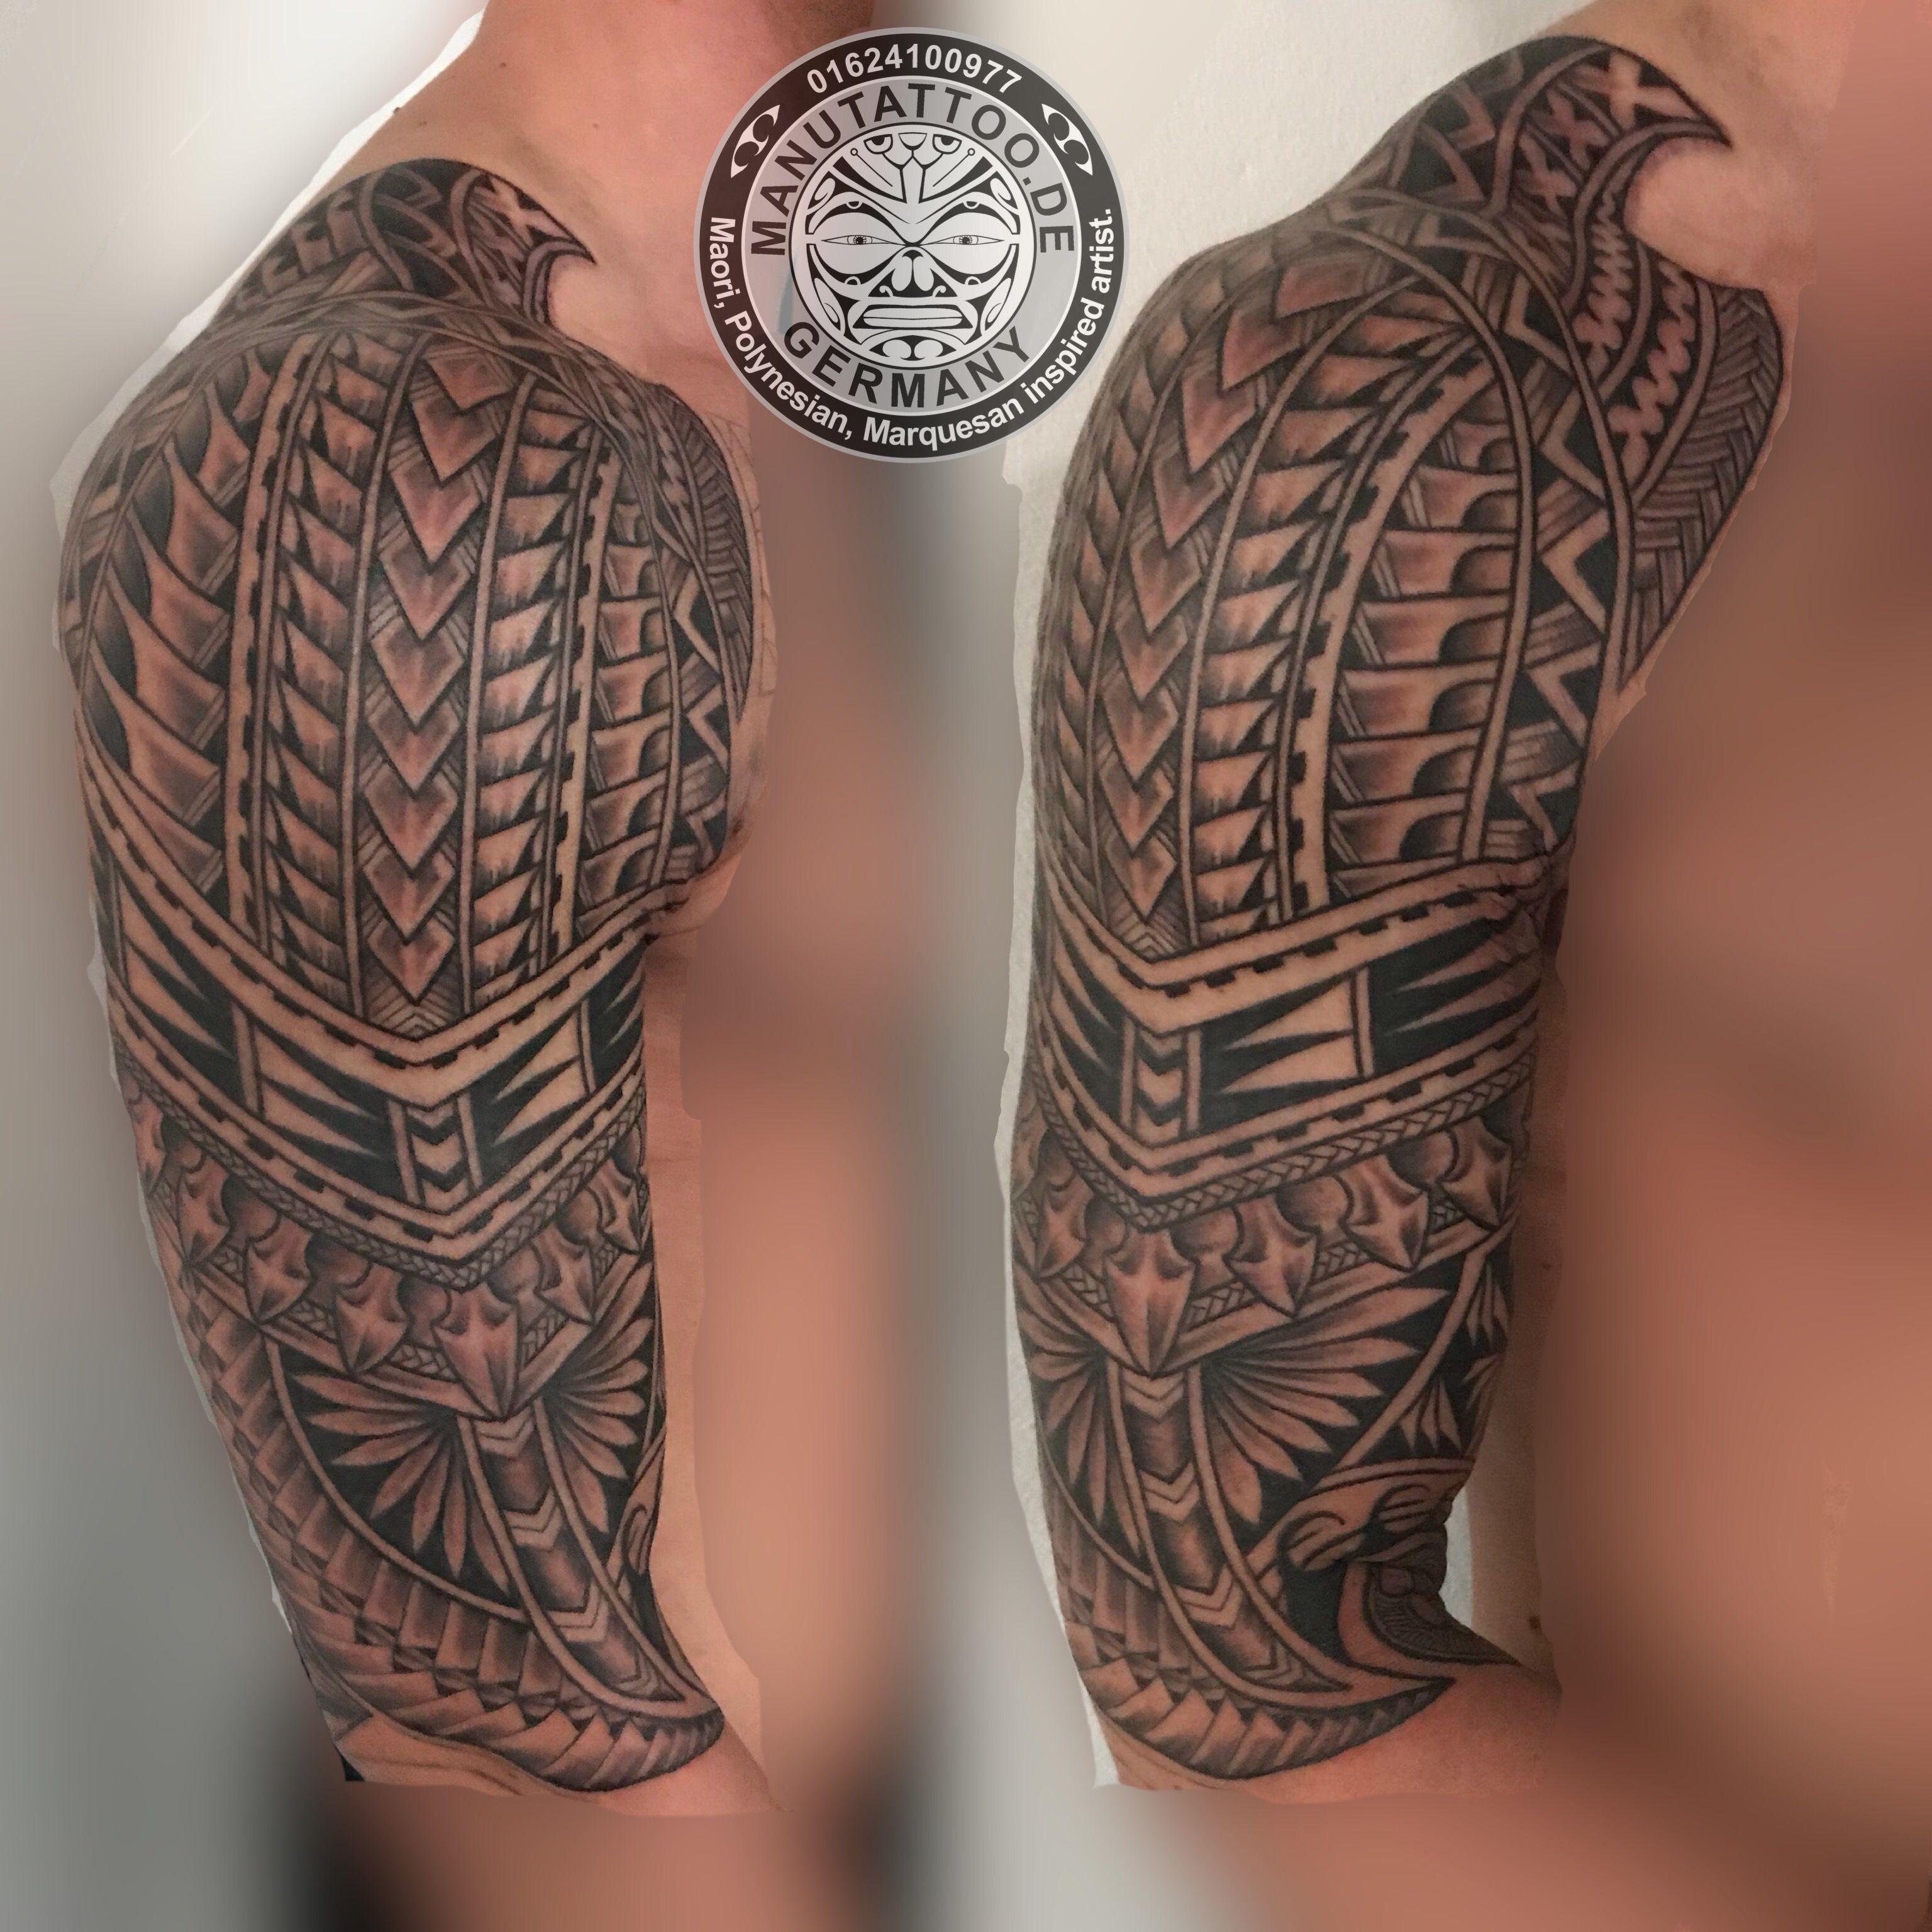 Polynesian Inspired Tattoo Freehand By Manu At Manu Tattoo